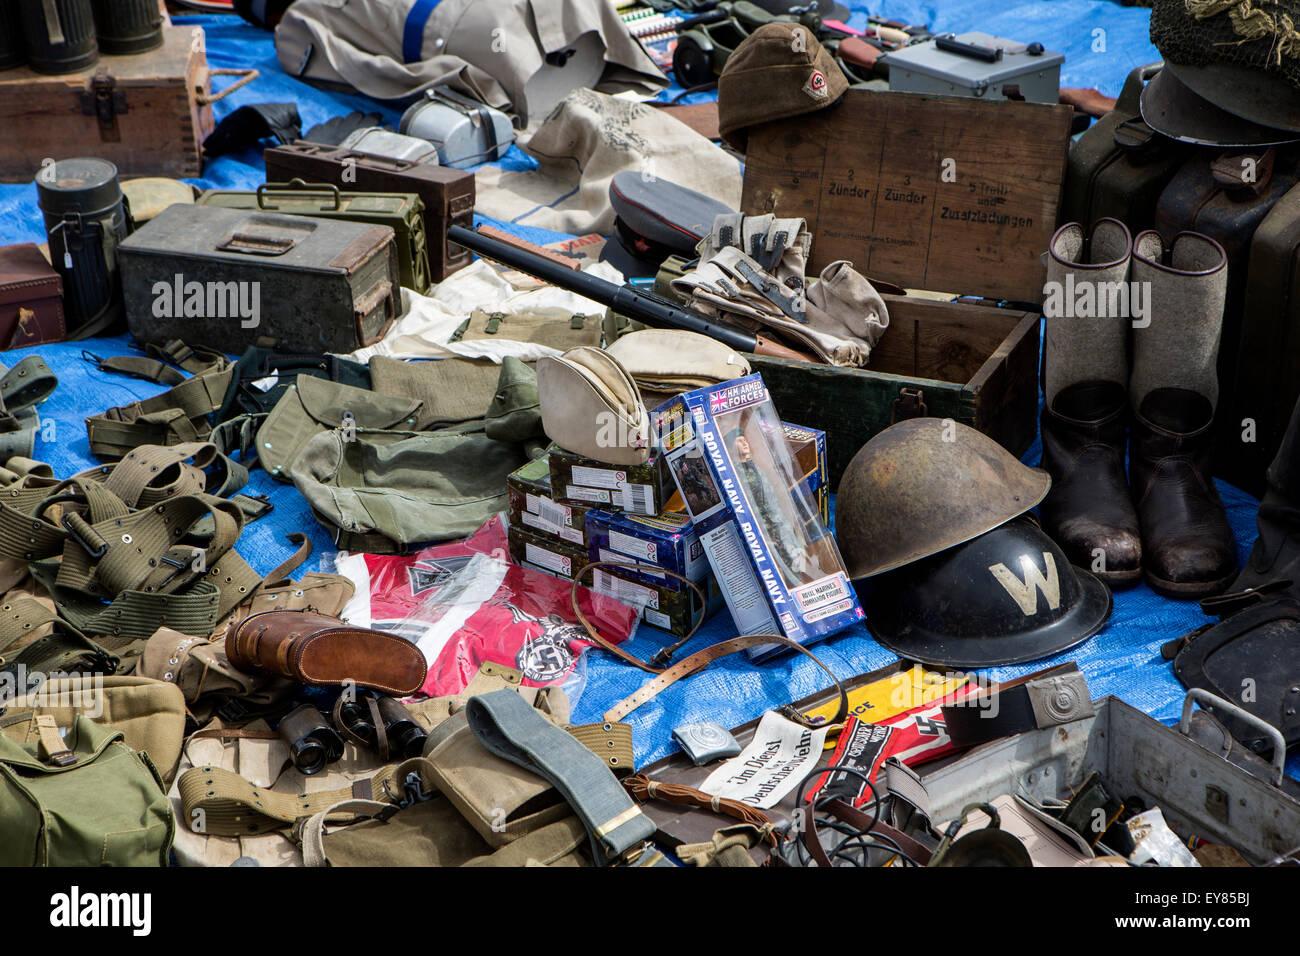 Militaria at the war and peace revival - Stock Image